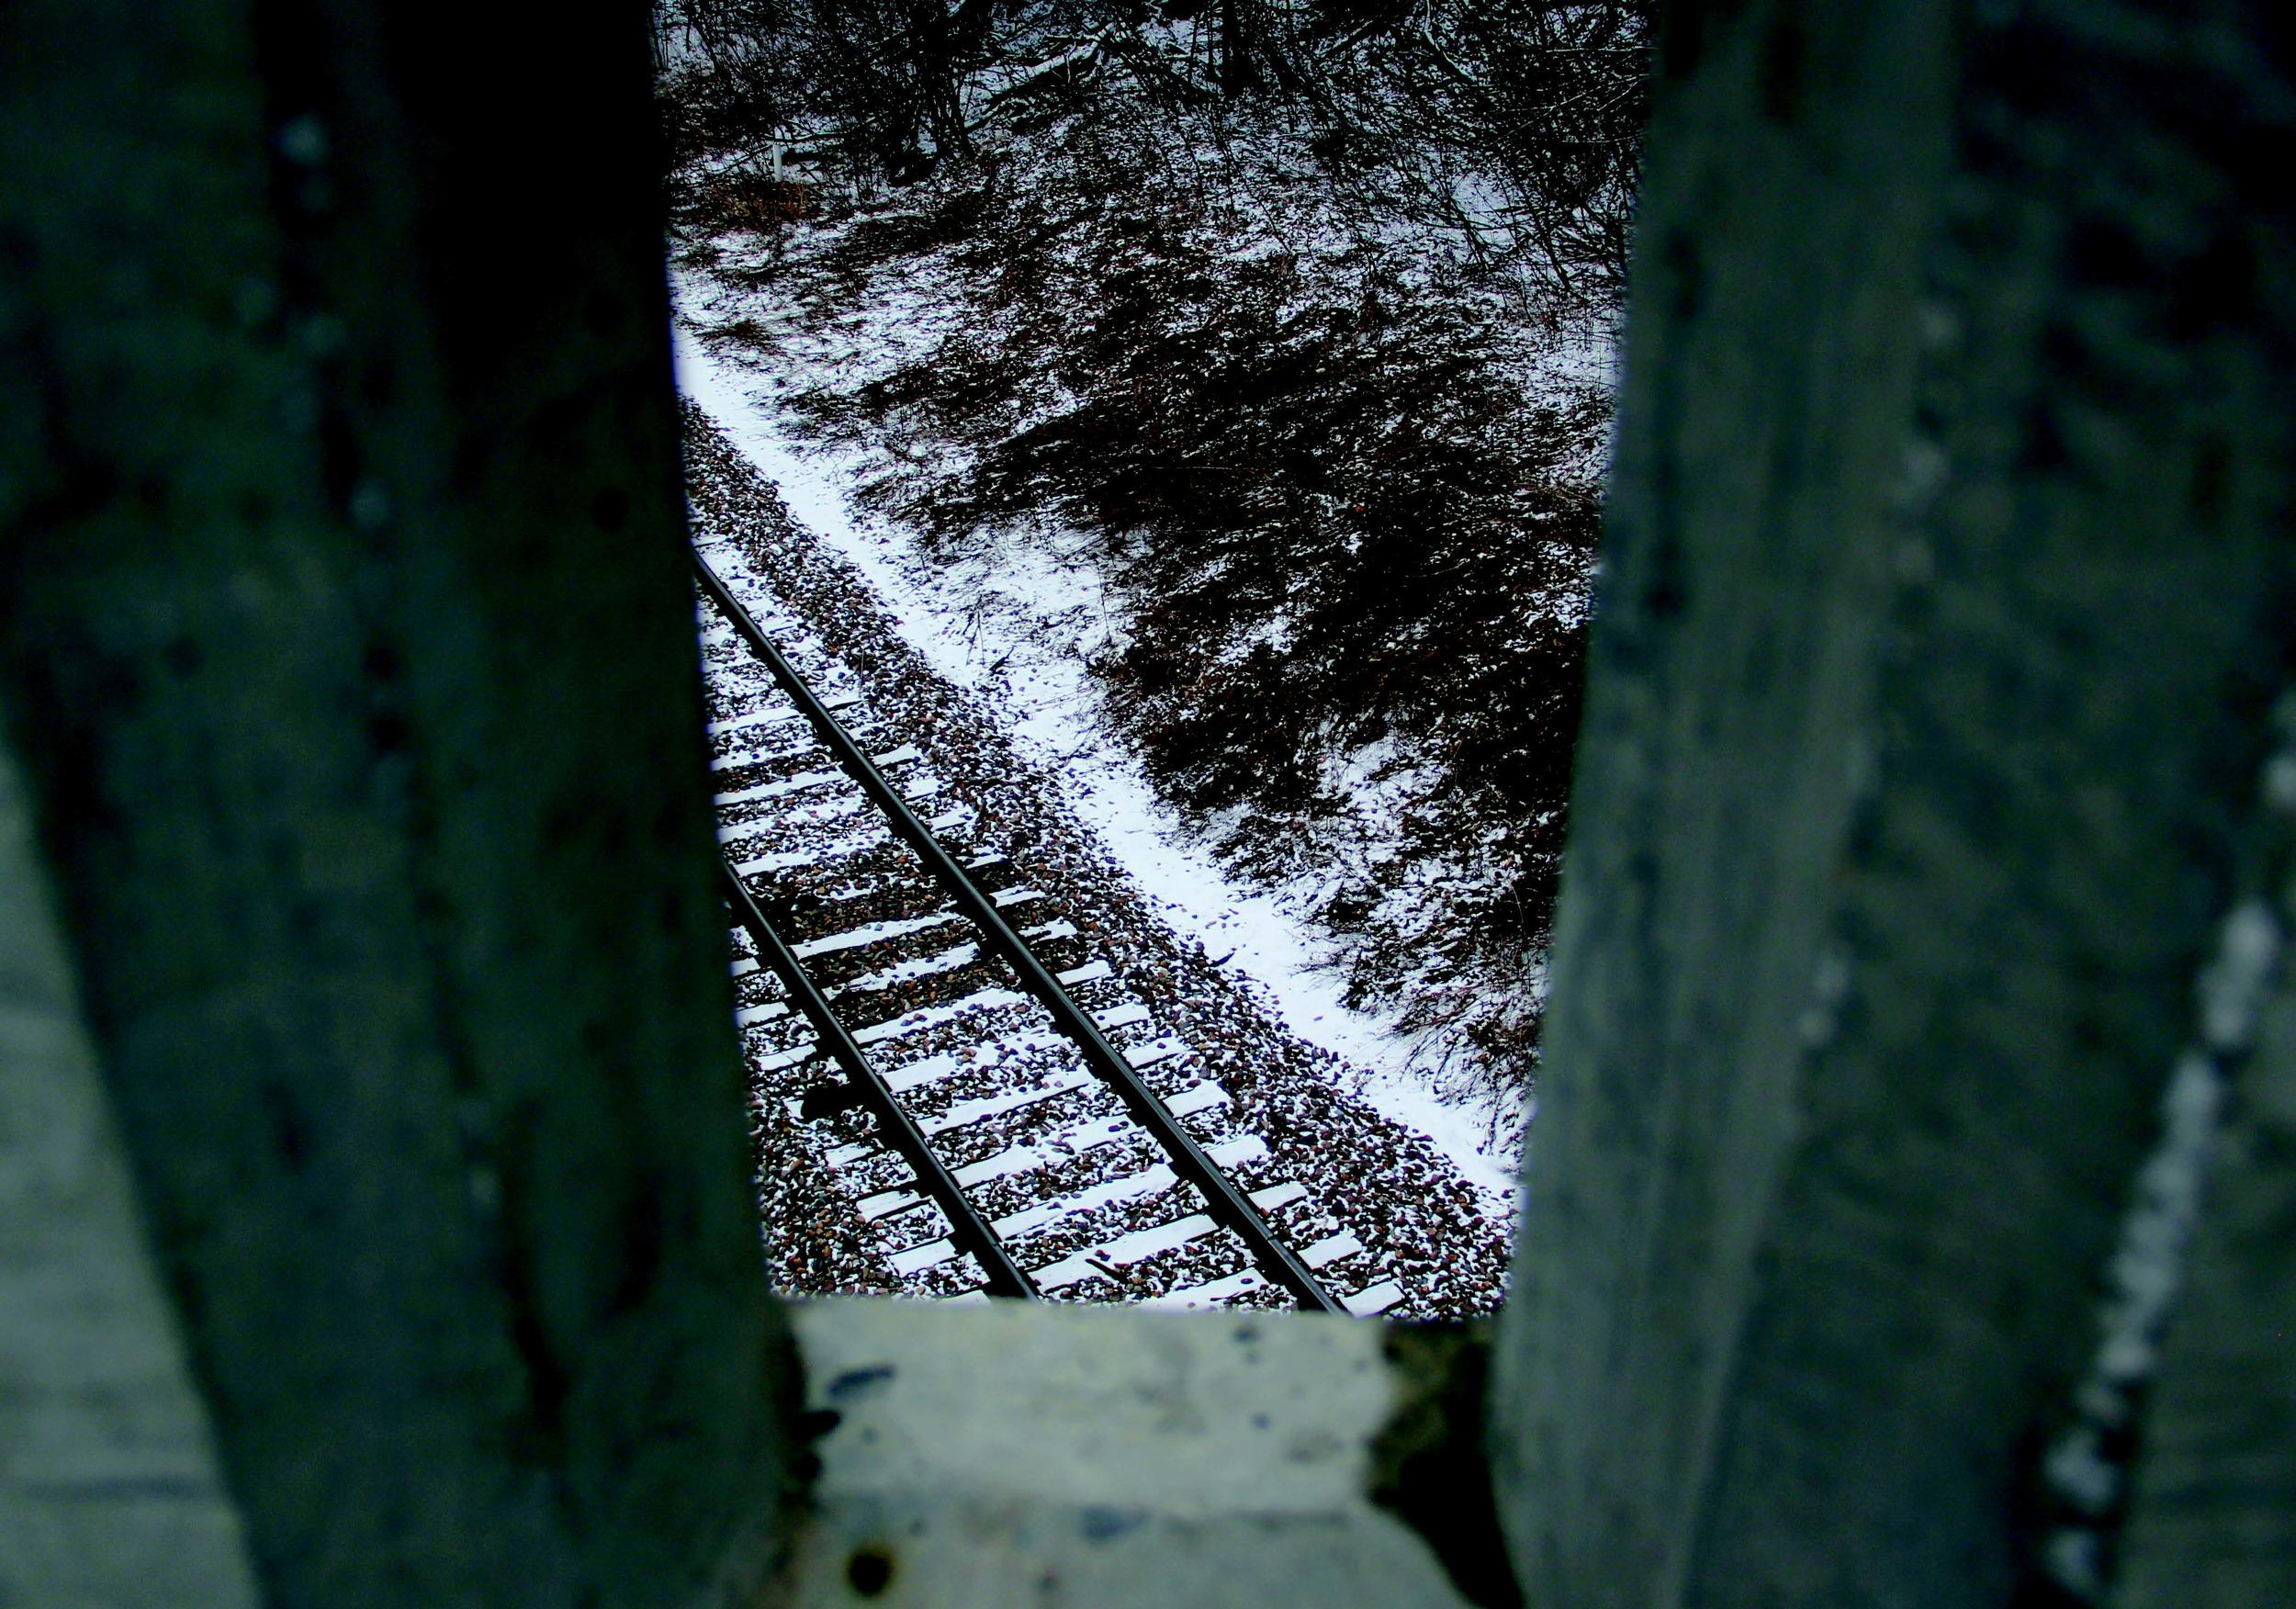 bridgeview.jpg